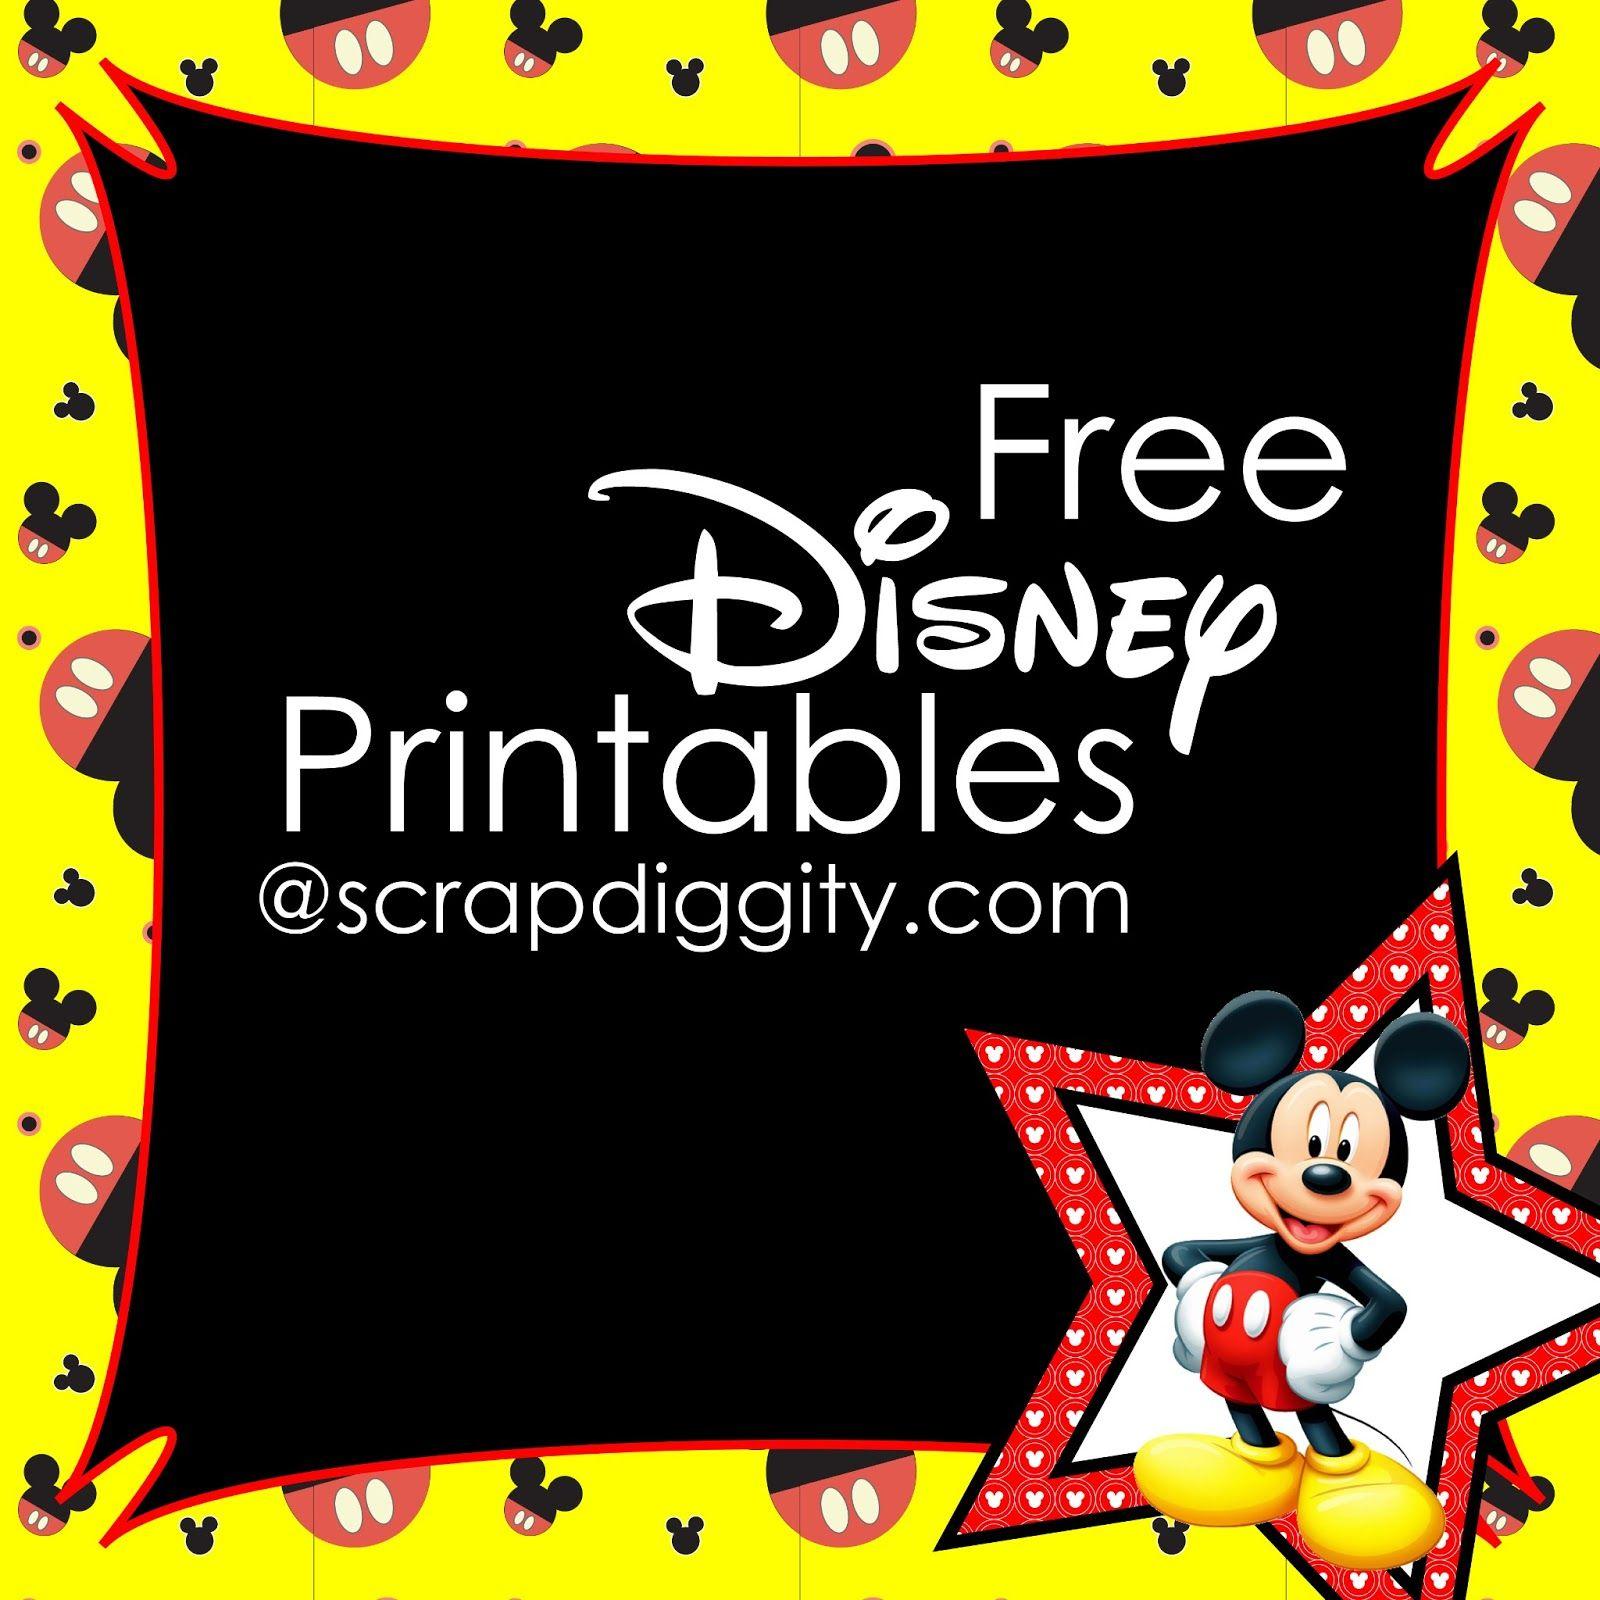 scrapdiggity disney printables great for the classroom mickey mouse printable games scrapdiggity bie mickey mouse diy card